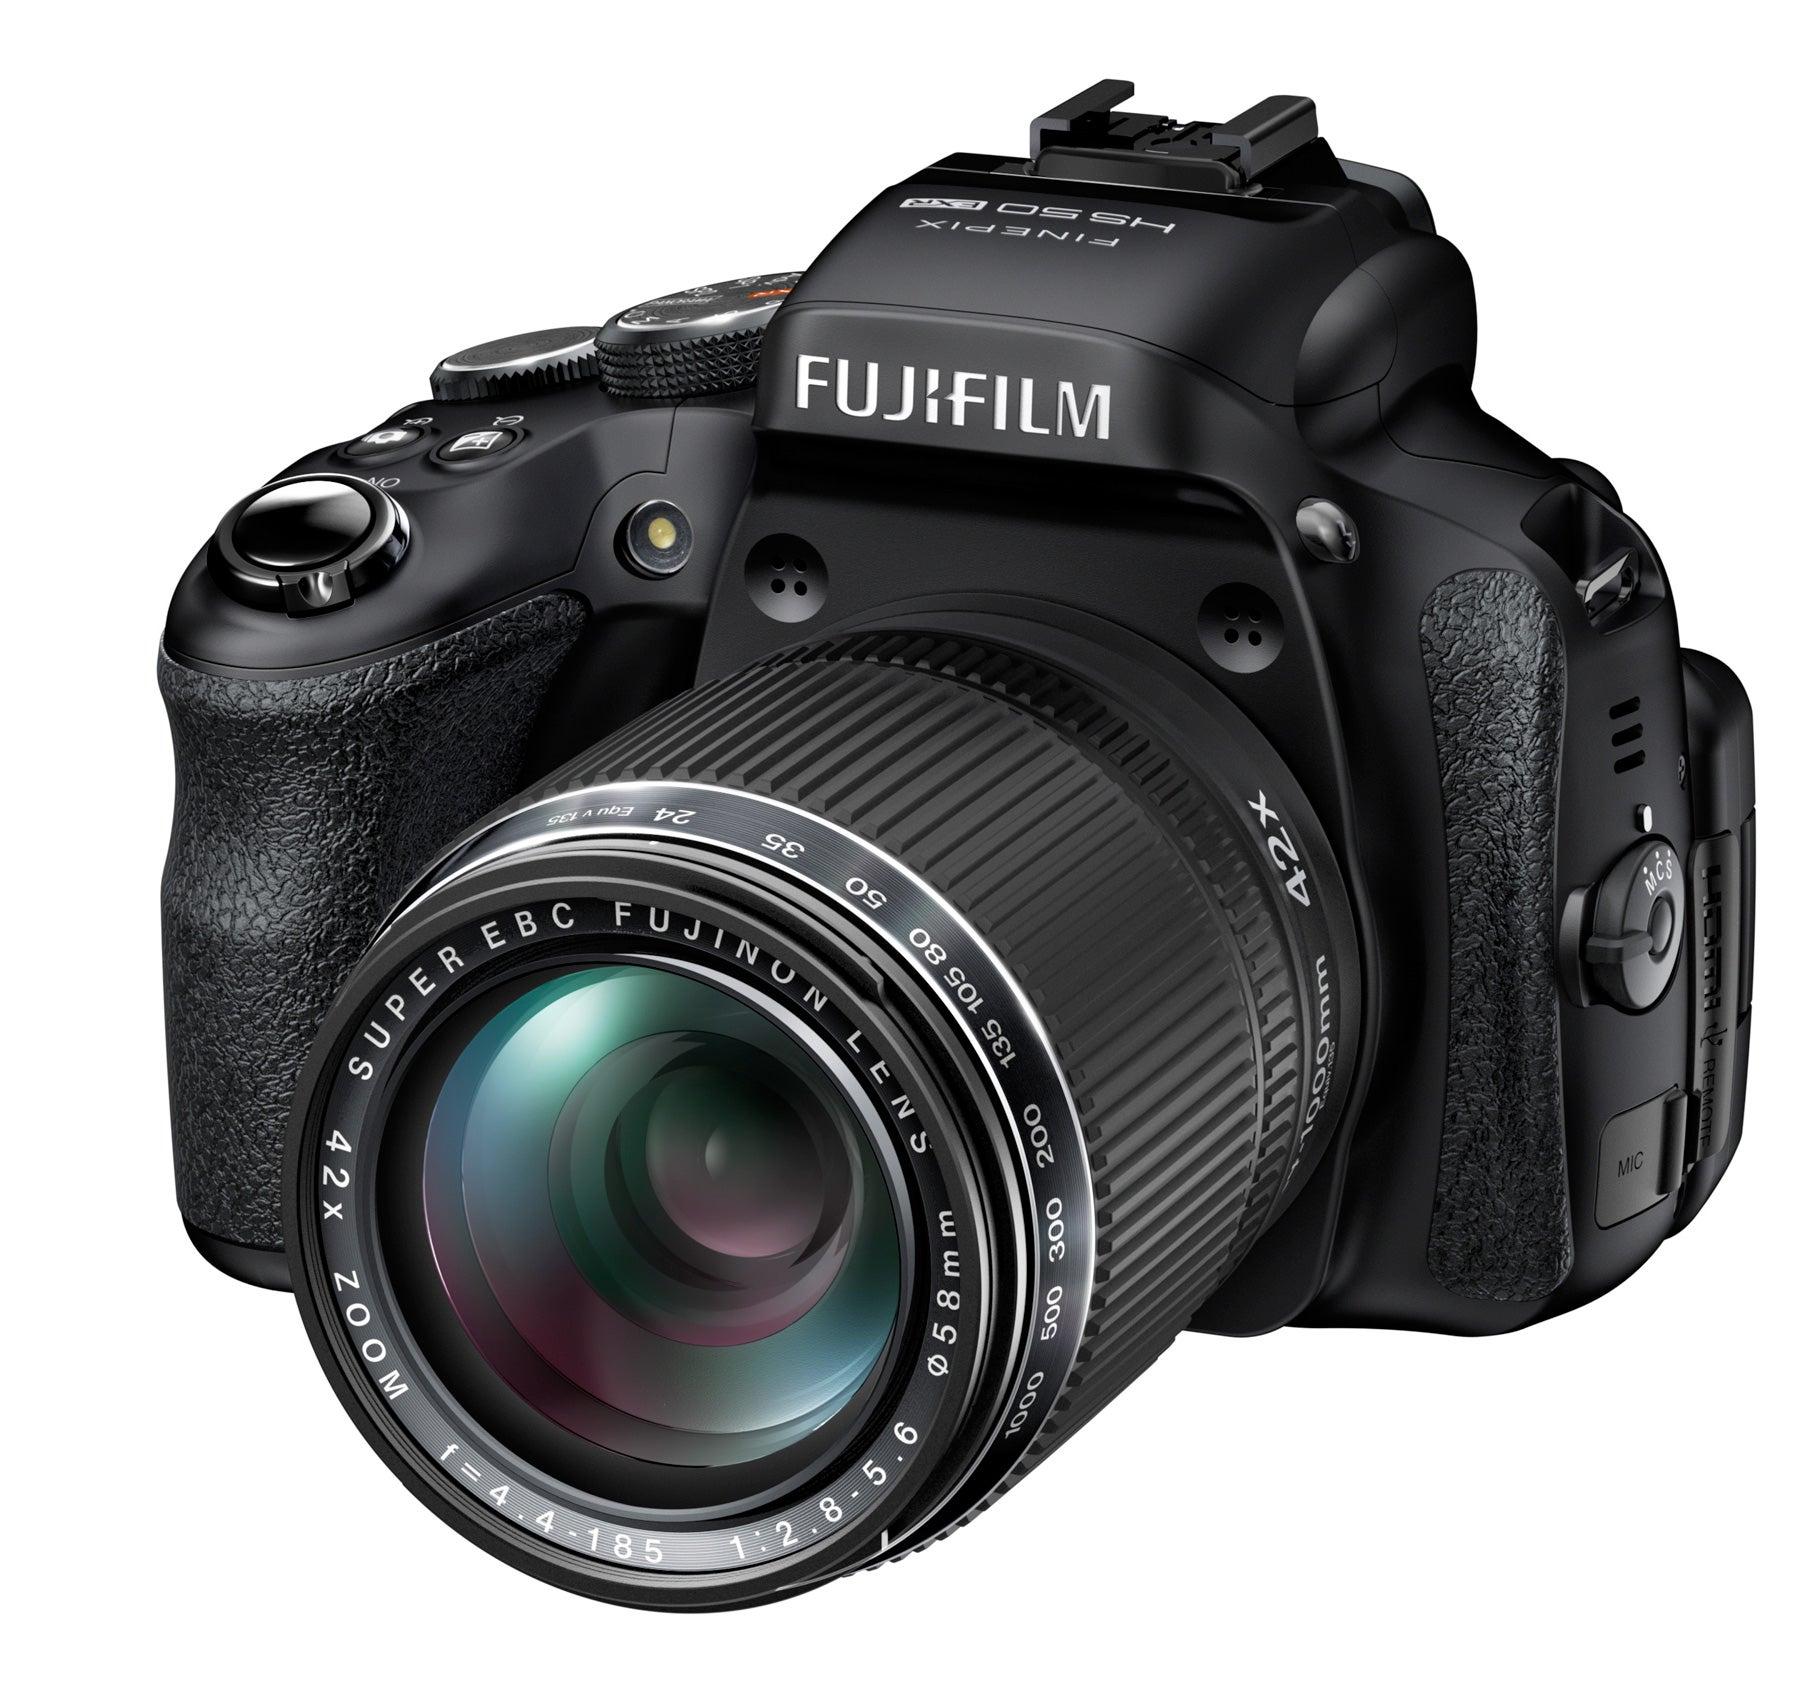 Camera Best Dslr Camera Professional dslr camera deals best digital slr reviews bridge of 2015 what camera